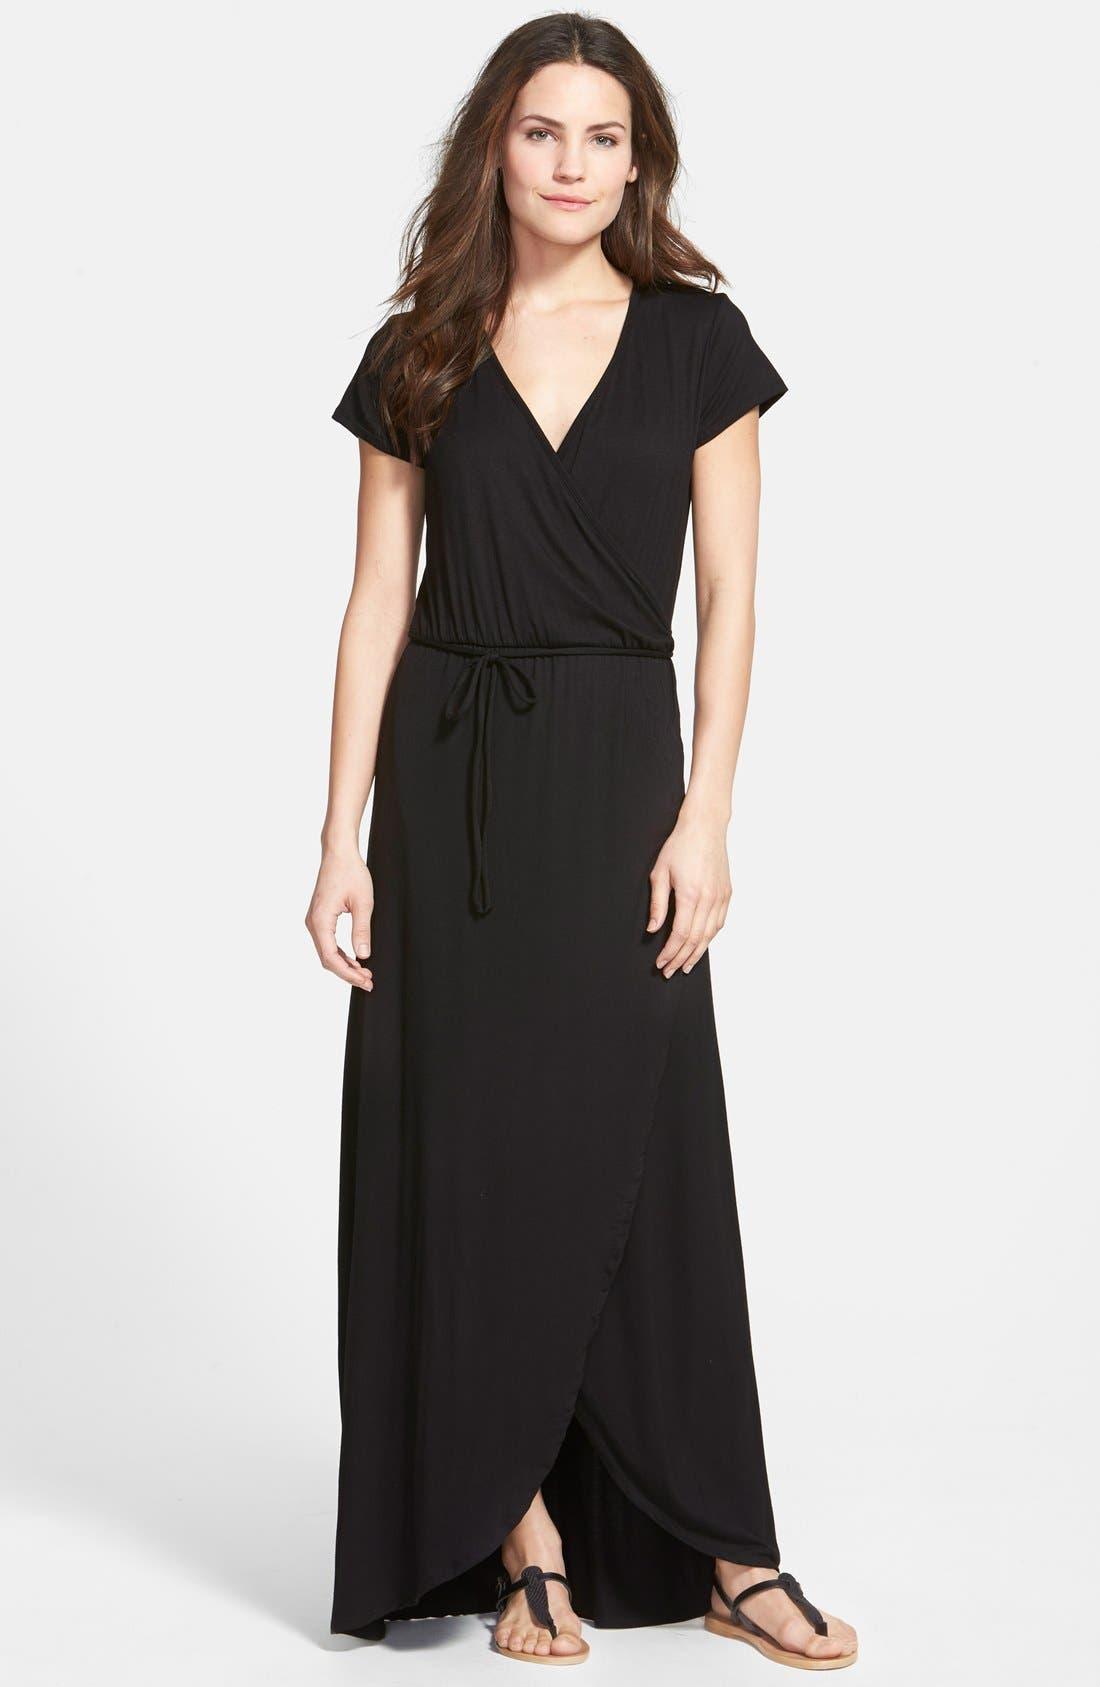 Main Image - Loveappella Cap Sleeve Faux Wrap Jersey Maxi Dress (Regular & Petite)